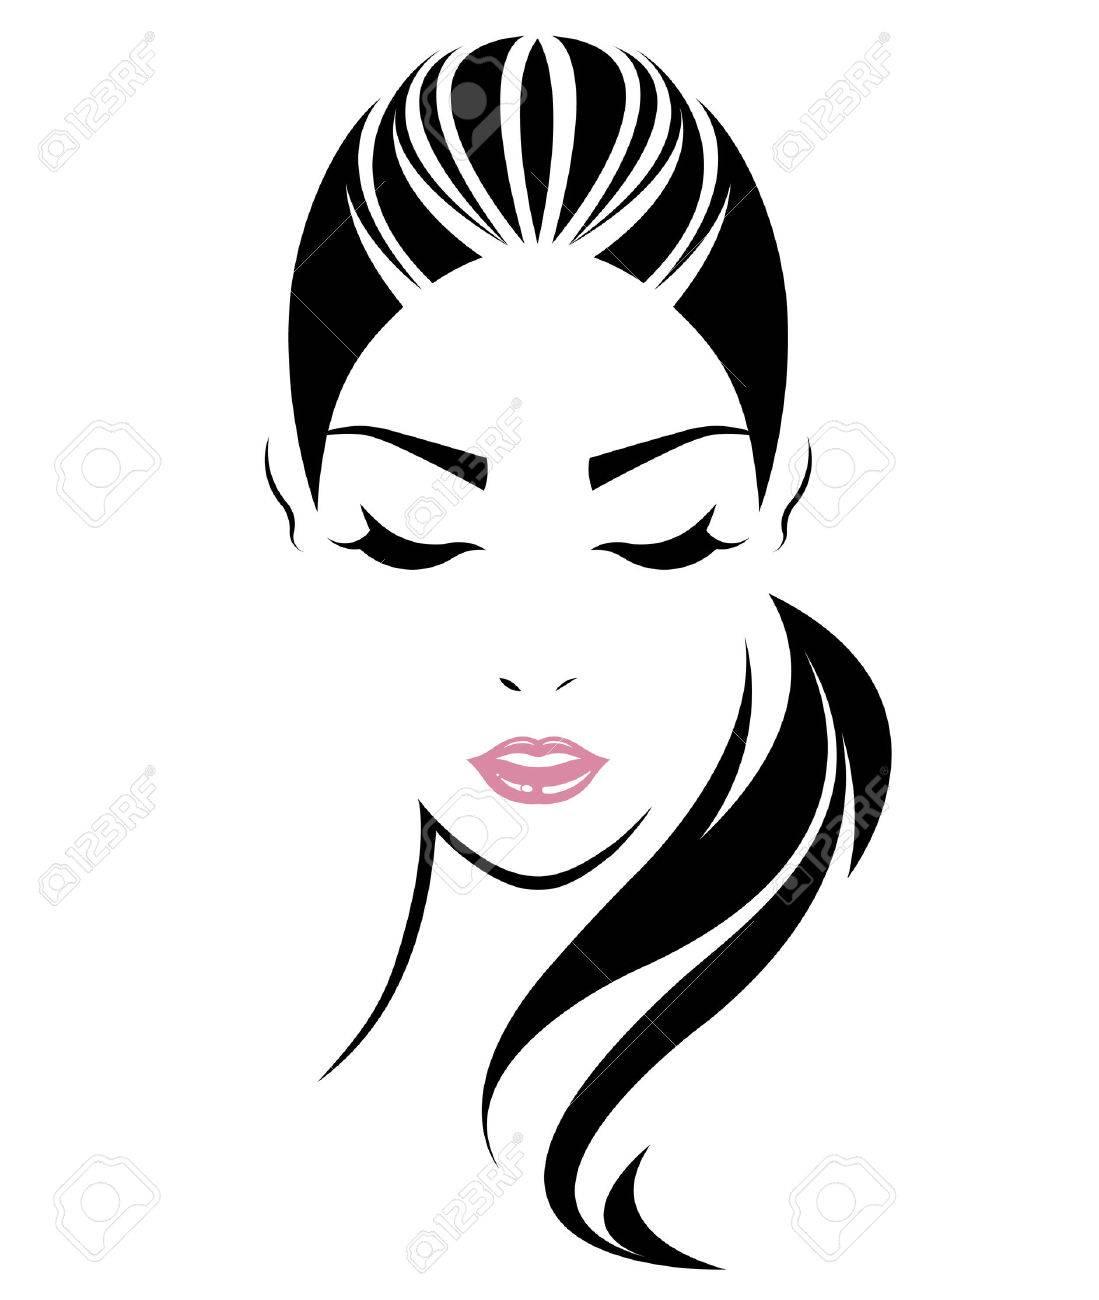 women long hair style icon, logo women face on white background, vector - 62776389